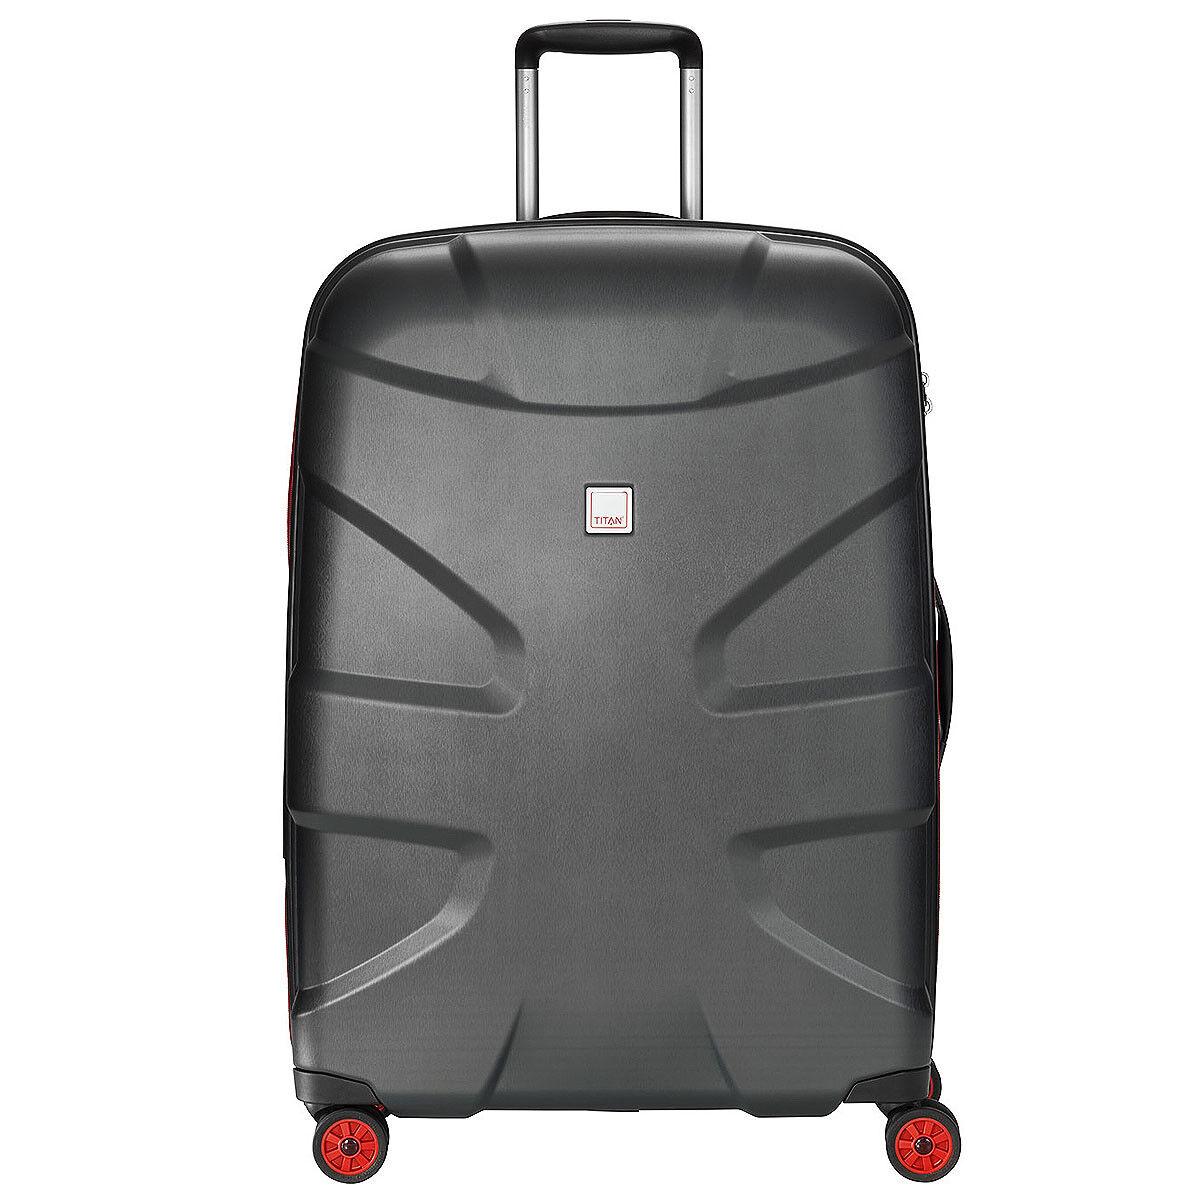 Titan X2 4-Rollen Polycarbonat 4-Rad Trolley Hartschale Koffer L 76 cm